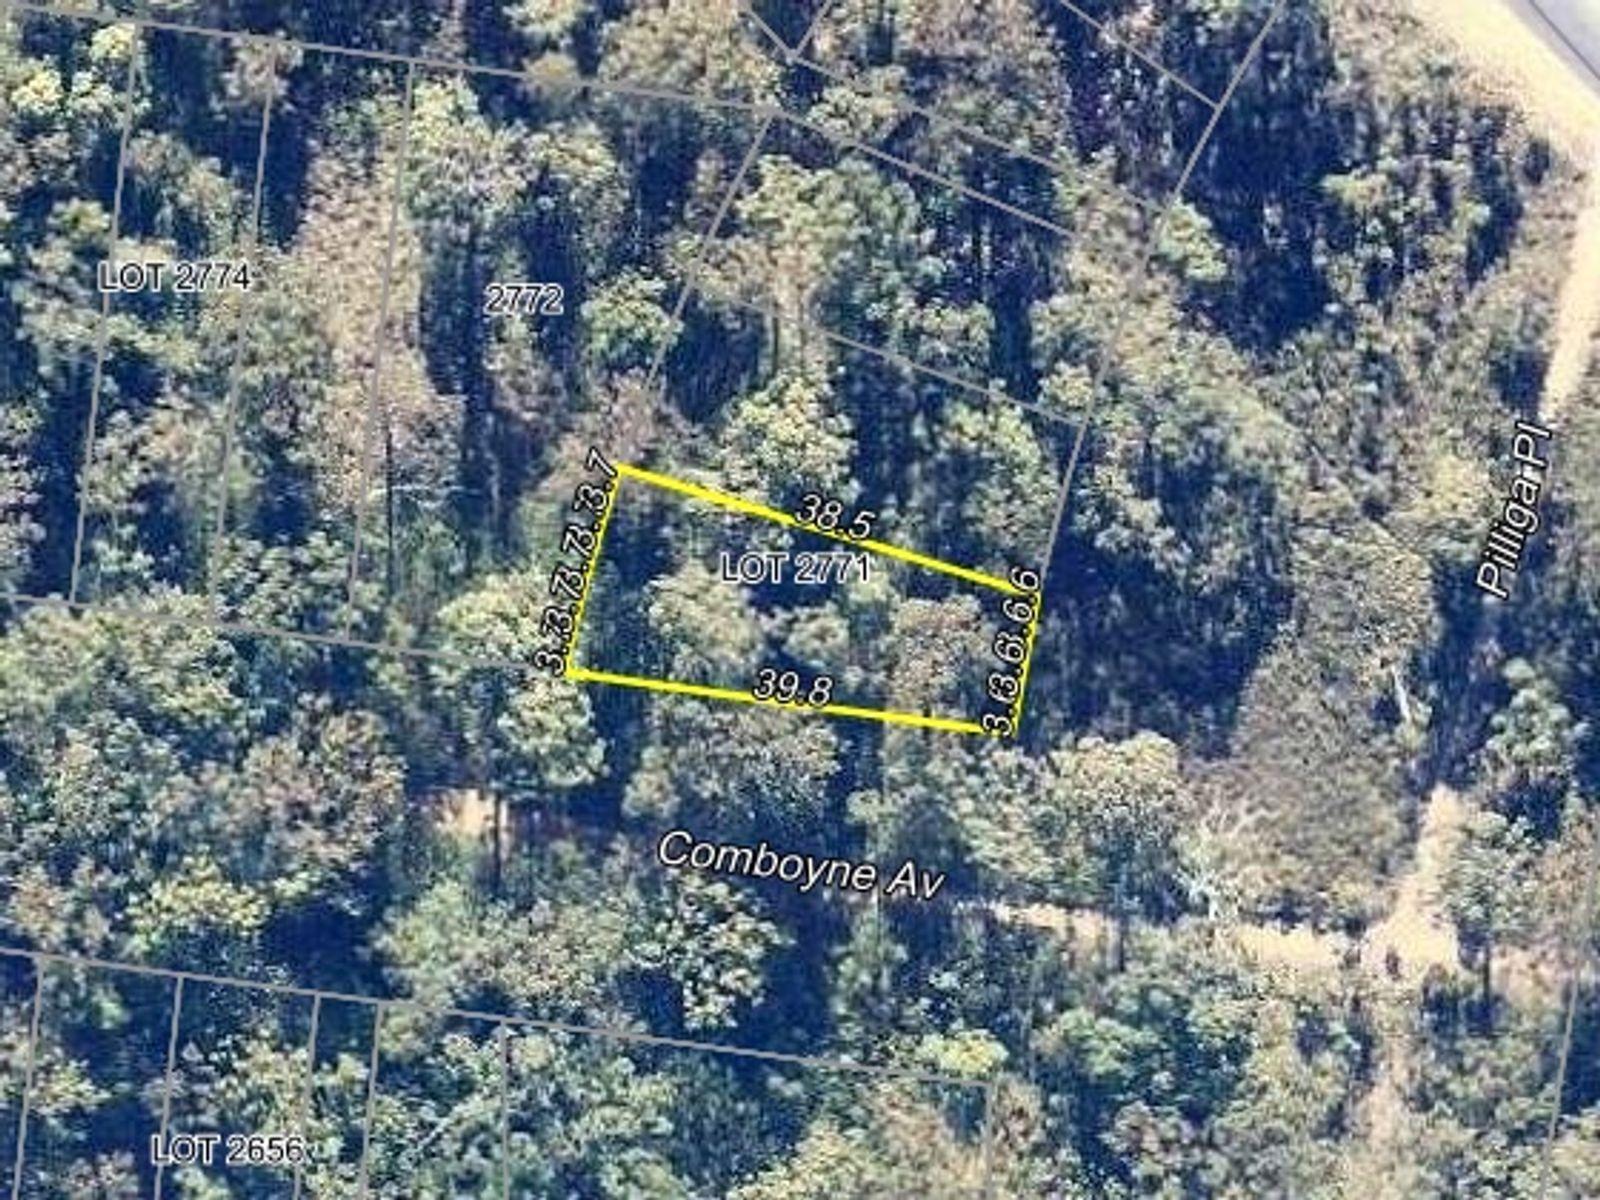 Lot 2771 Pilliga Place, North Arm Cove, NSW 2324